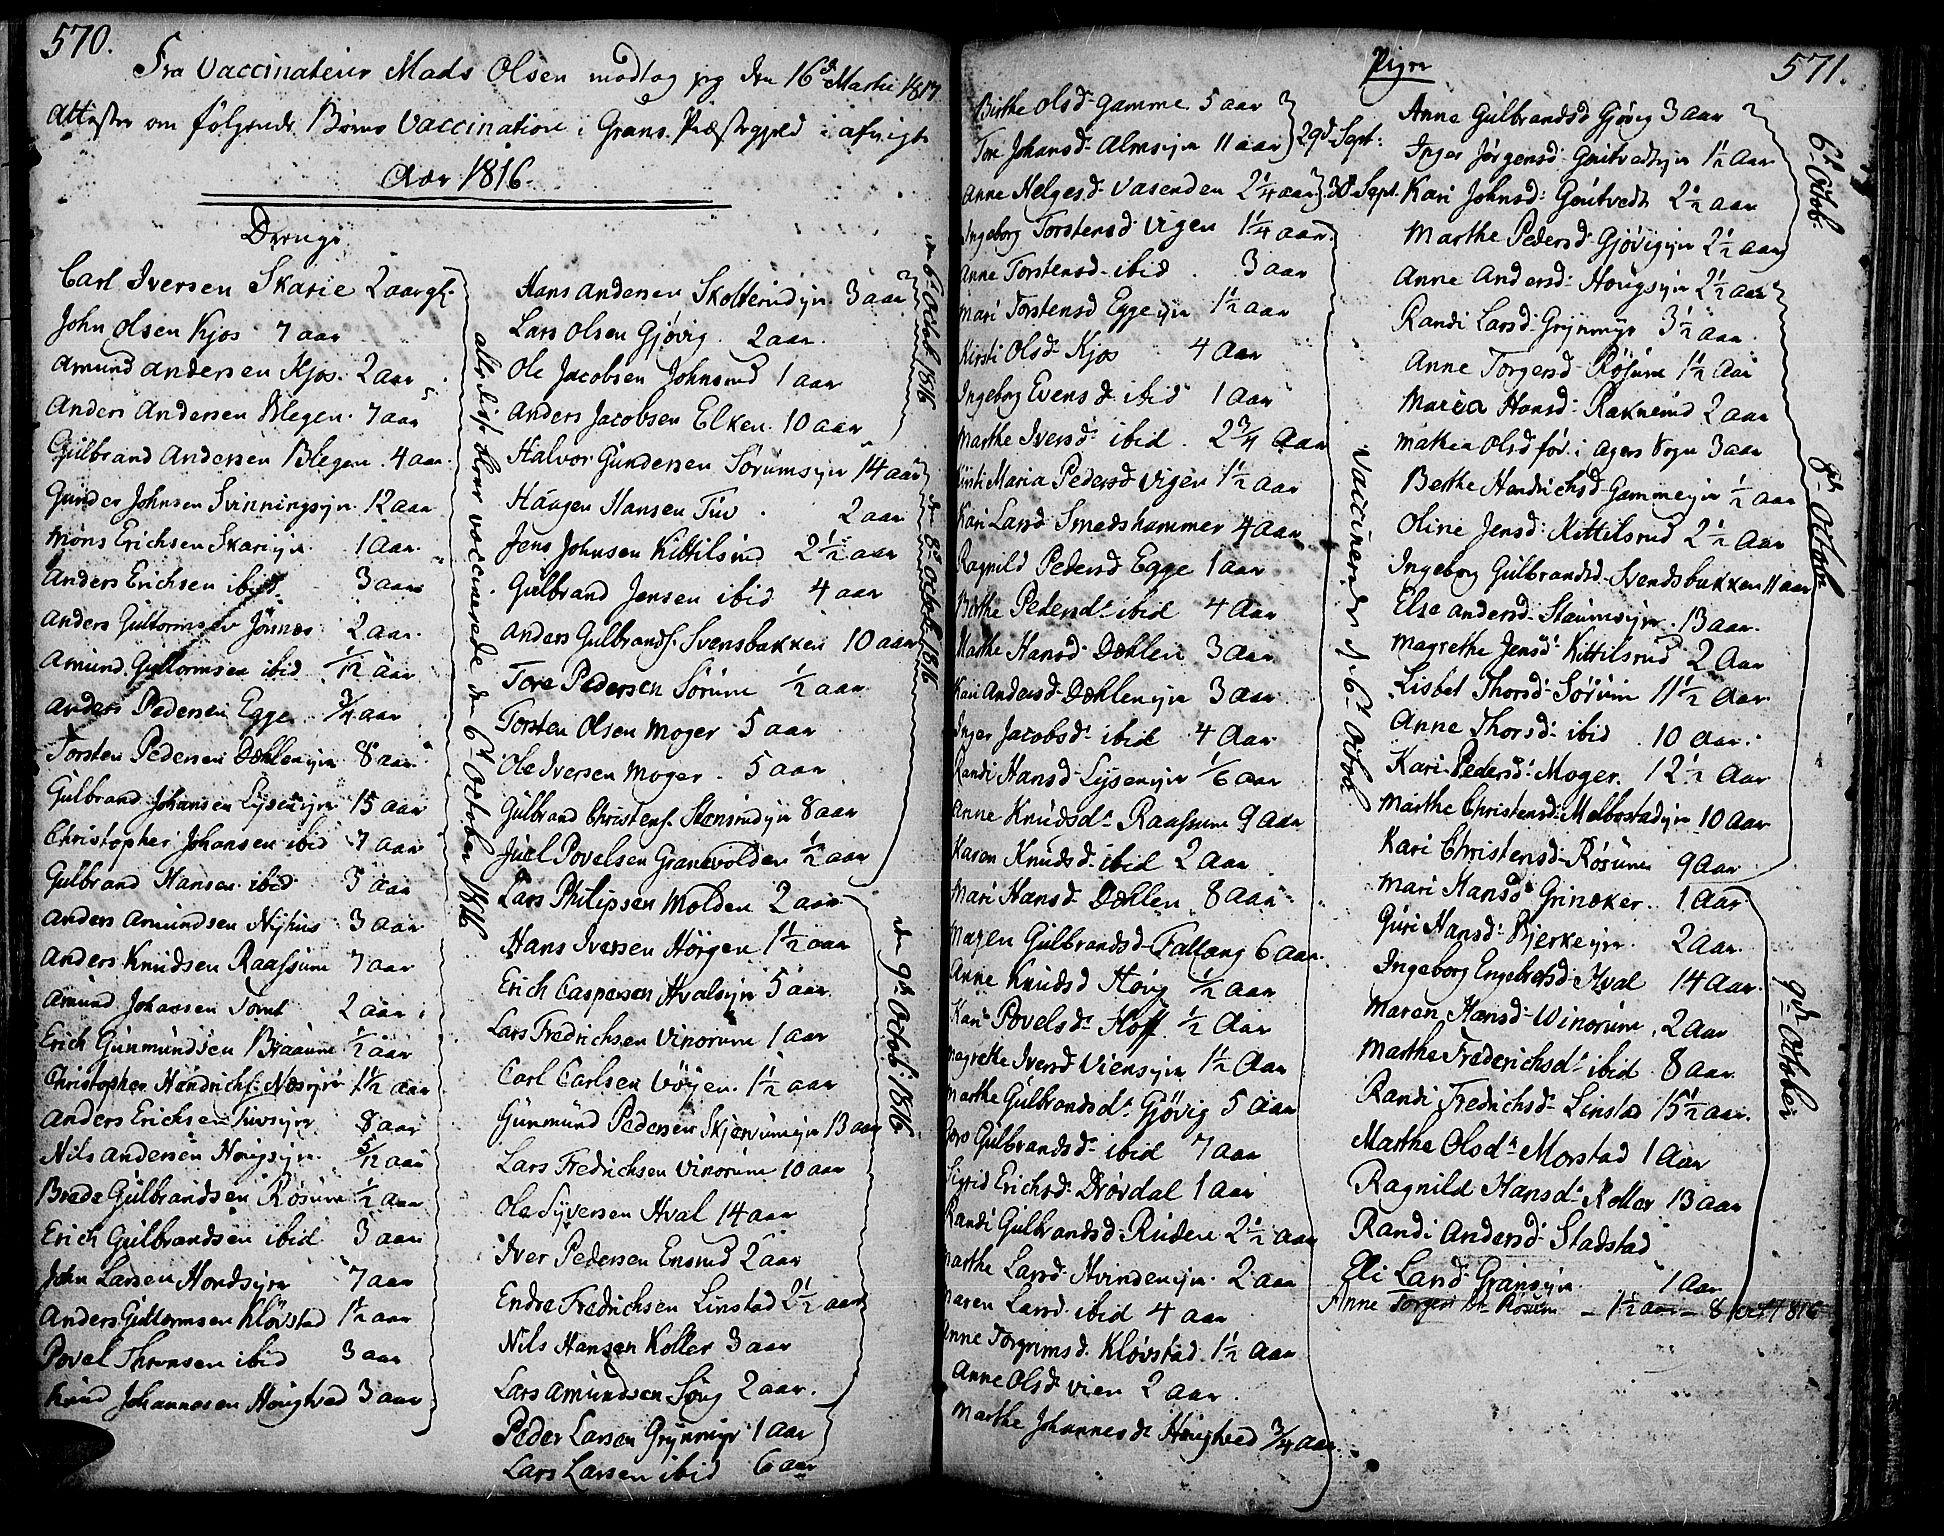 SAH, Gran prestekontor, Ministerialbok nr. 6, 1787-1824, s. 570-571